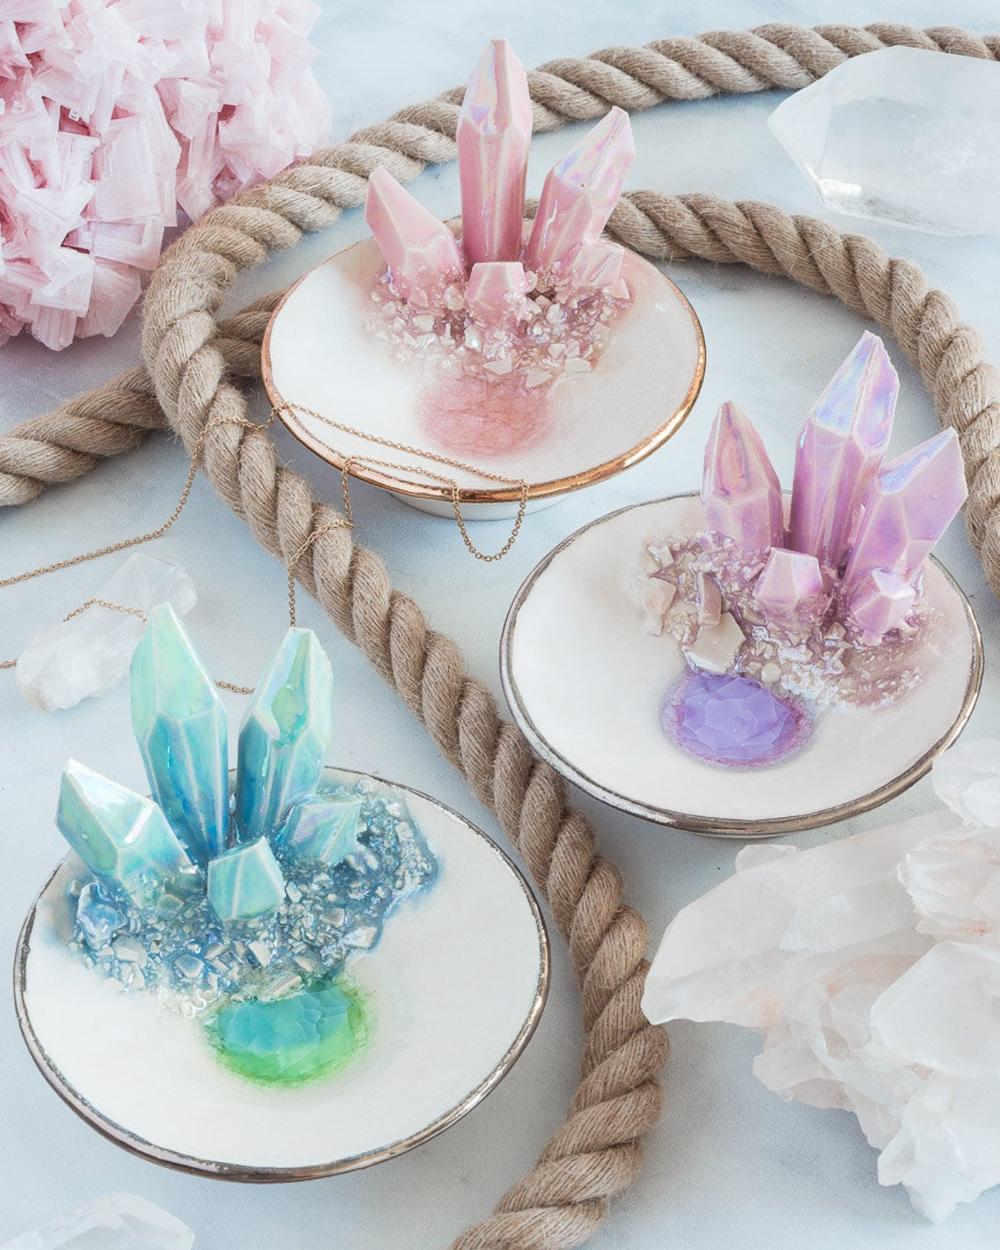 DesignYourOwn Trinket Dish Diy resin crafts, Crystal